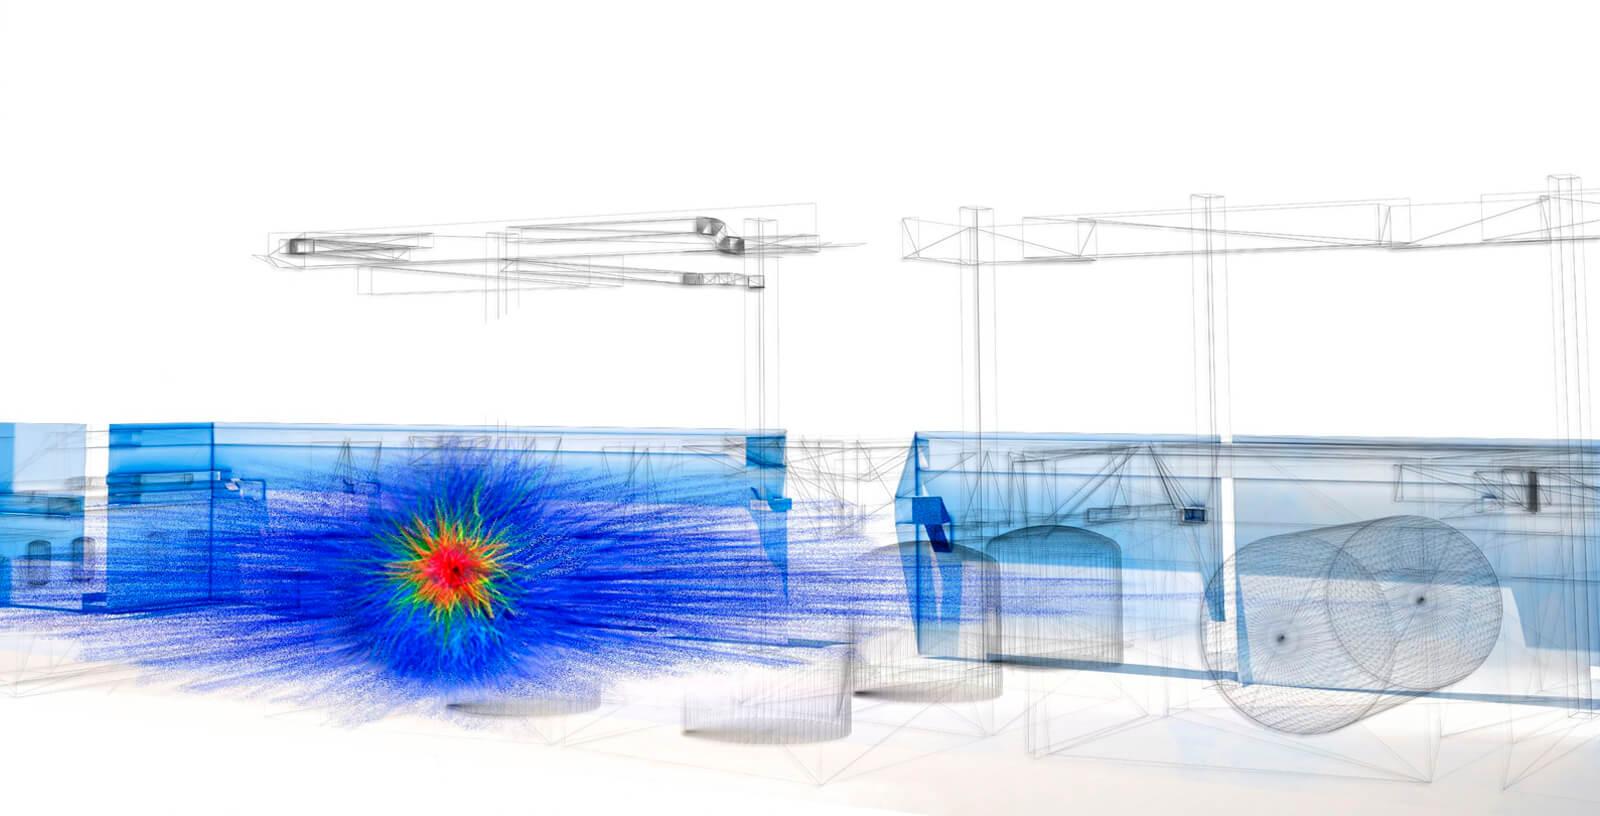 IDOM_Nuclear_Services_Preliminary_Design_of_IFMIF_EVEDA_Beam_Dump_ImagebyI_igoGutierrez